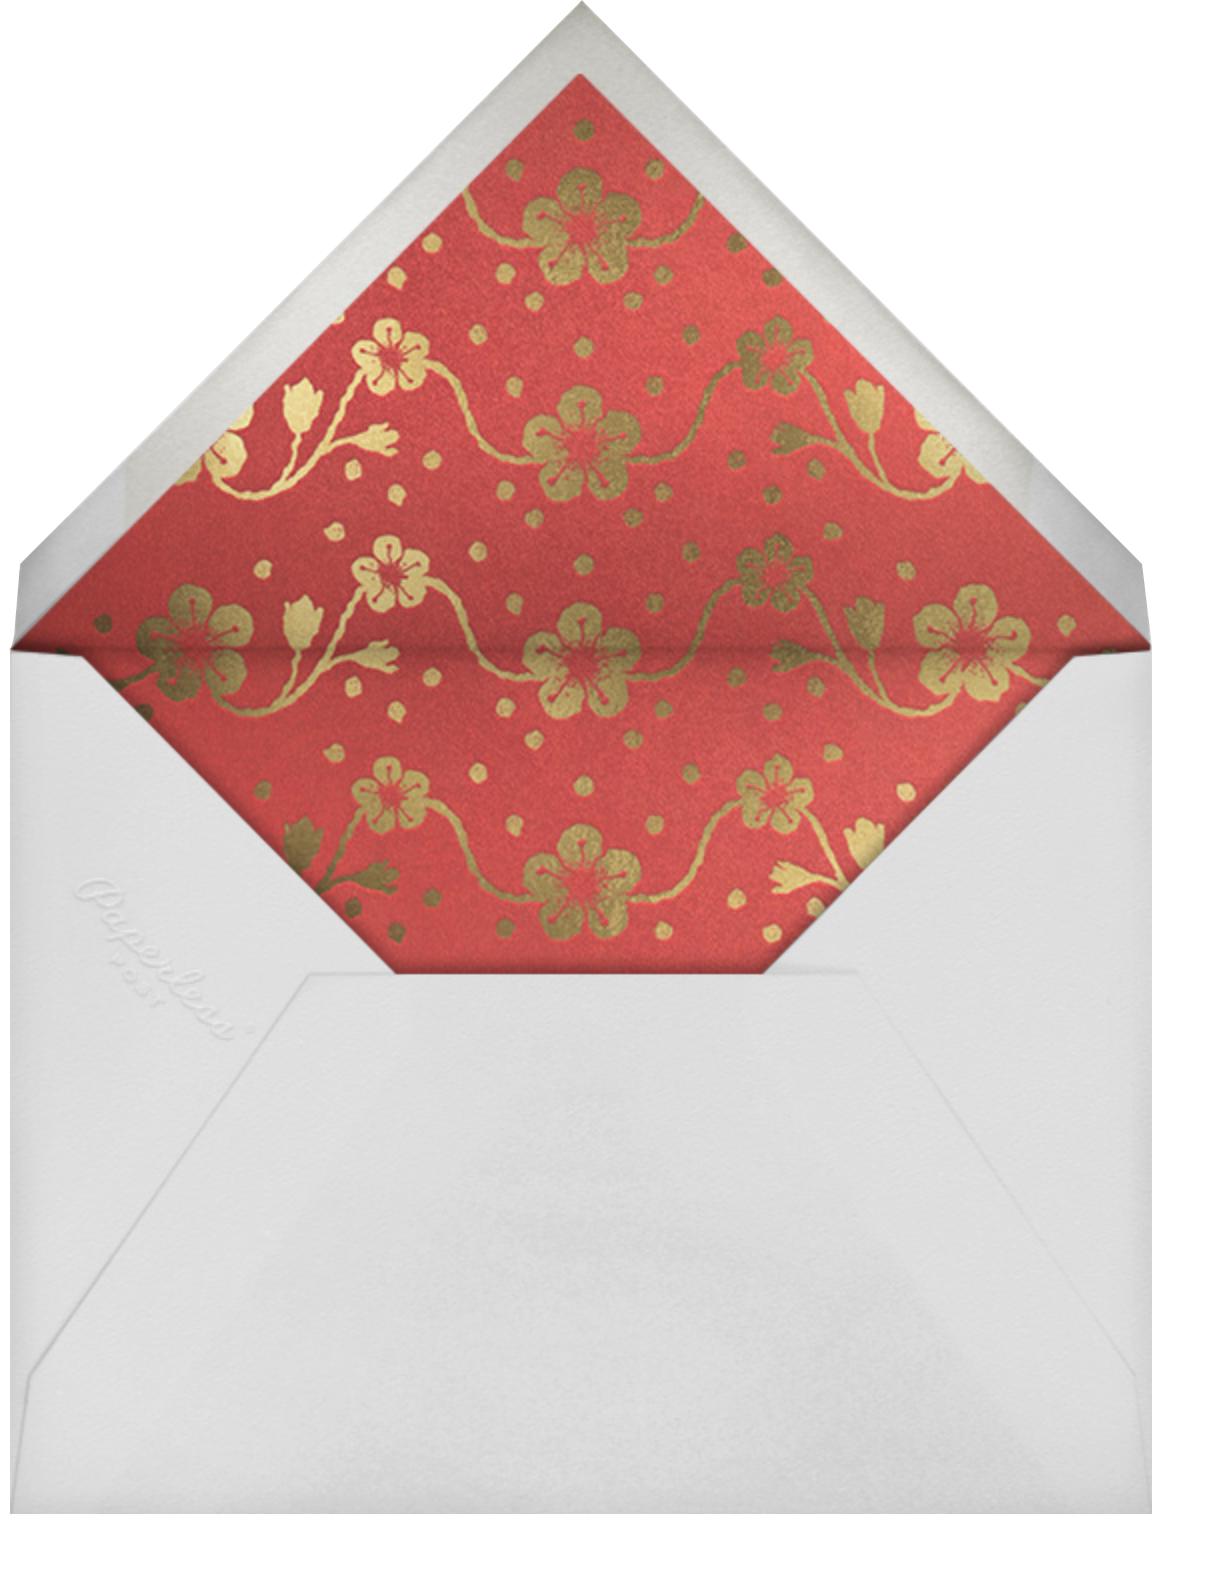 Floral Lantern - Paperless Post - Lunar New Year - envelope back